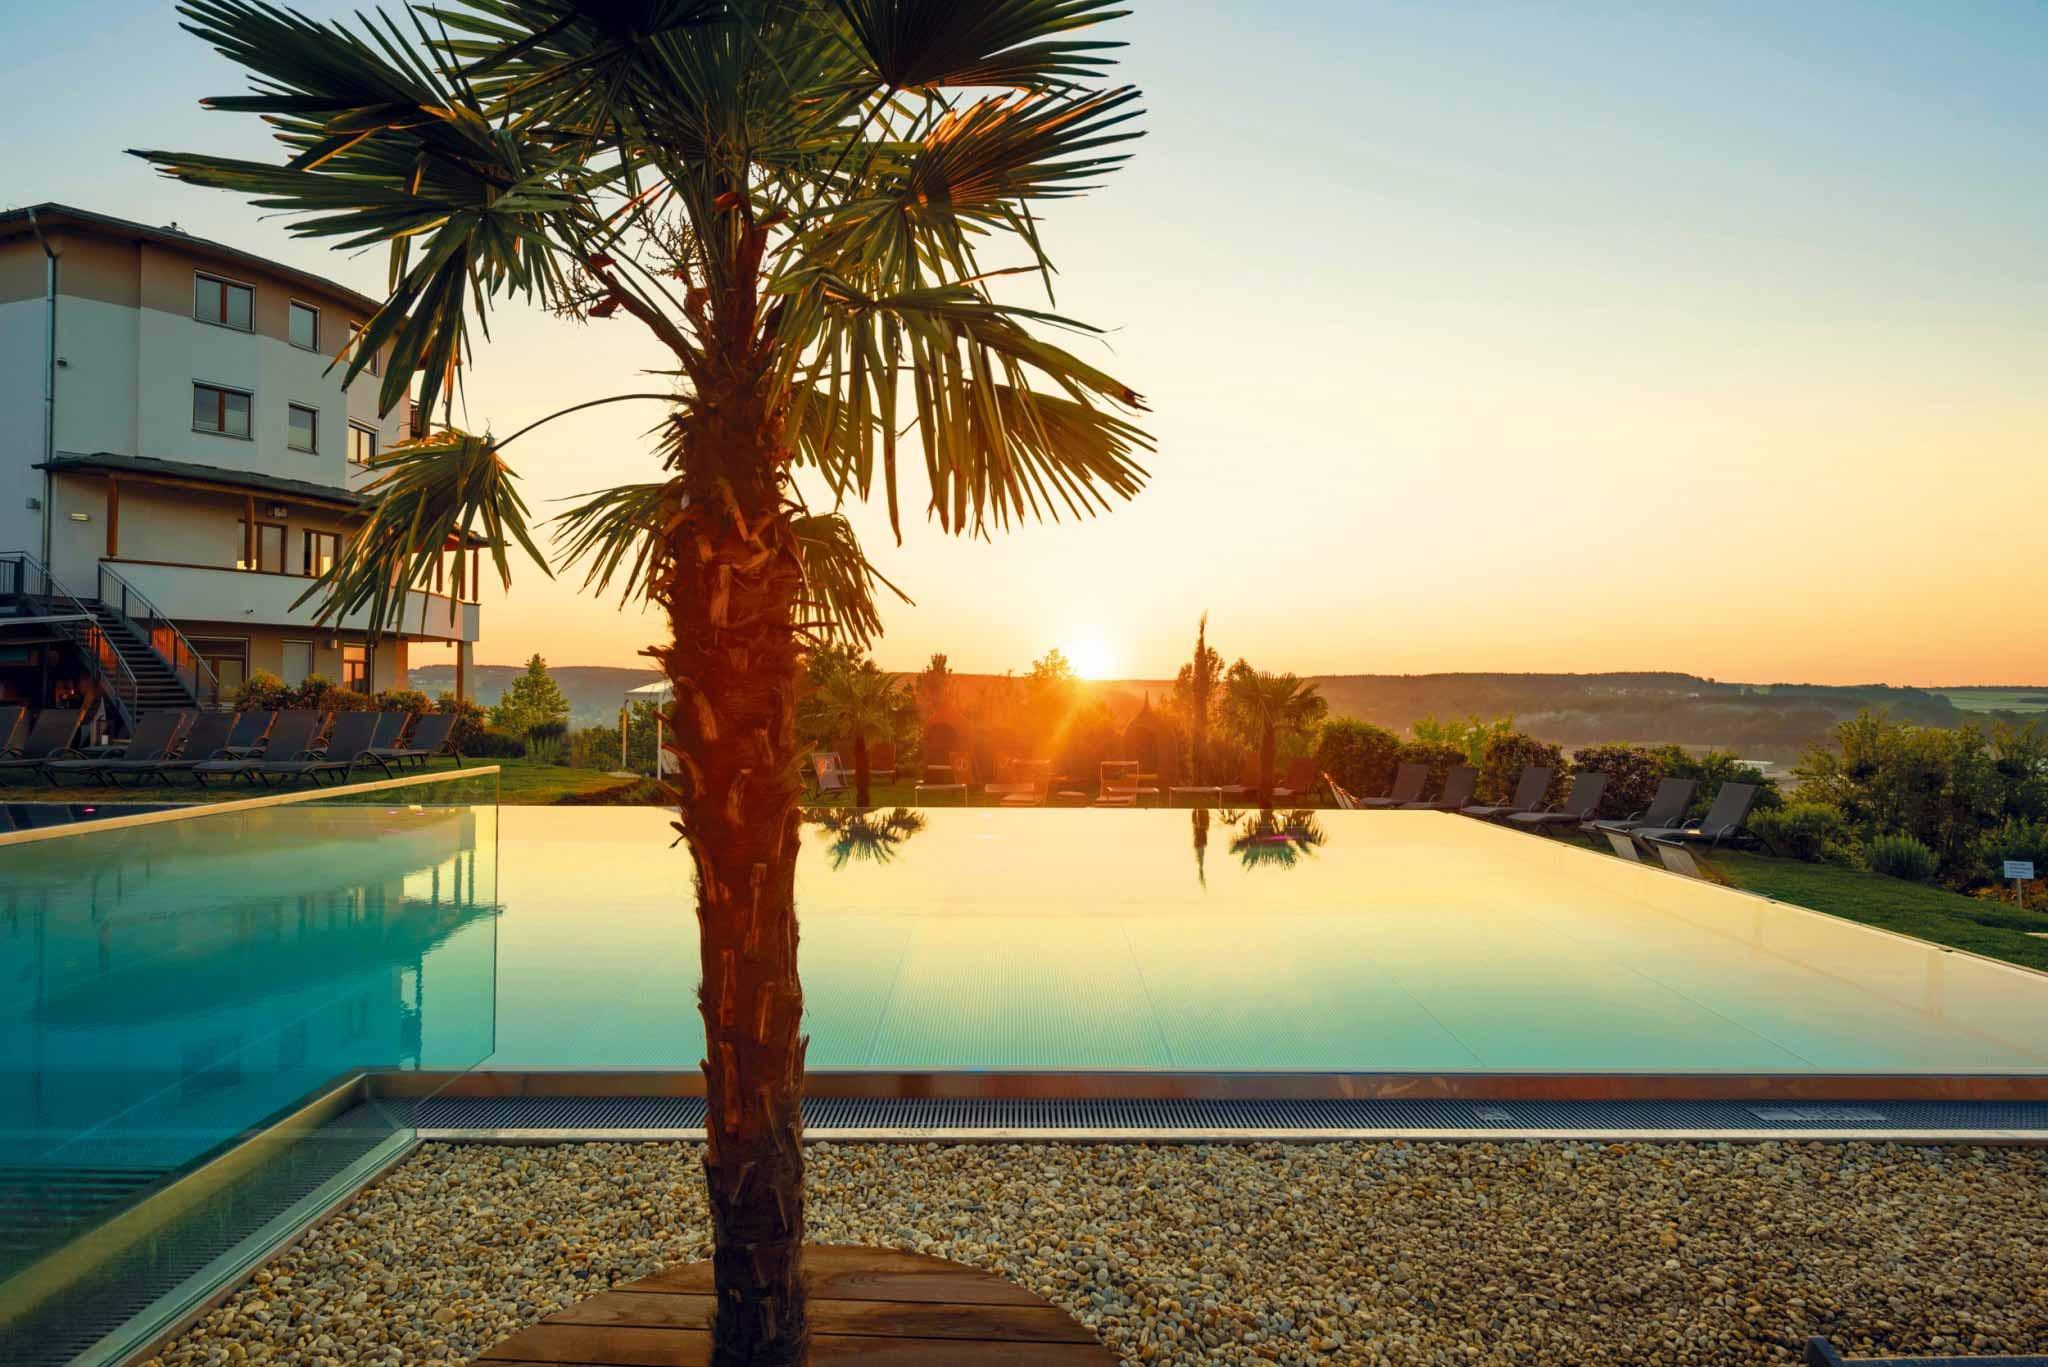 Infinity-Sportpool bei Sonnenaufgang im Hotel Larimar